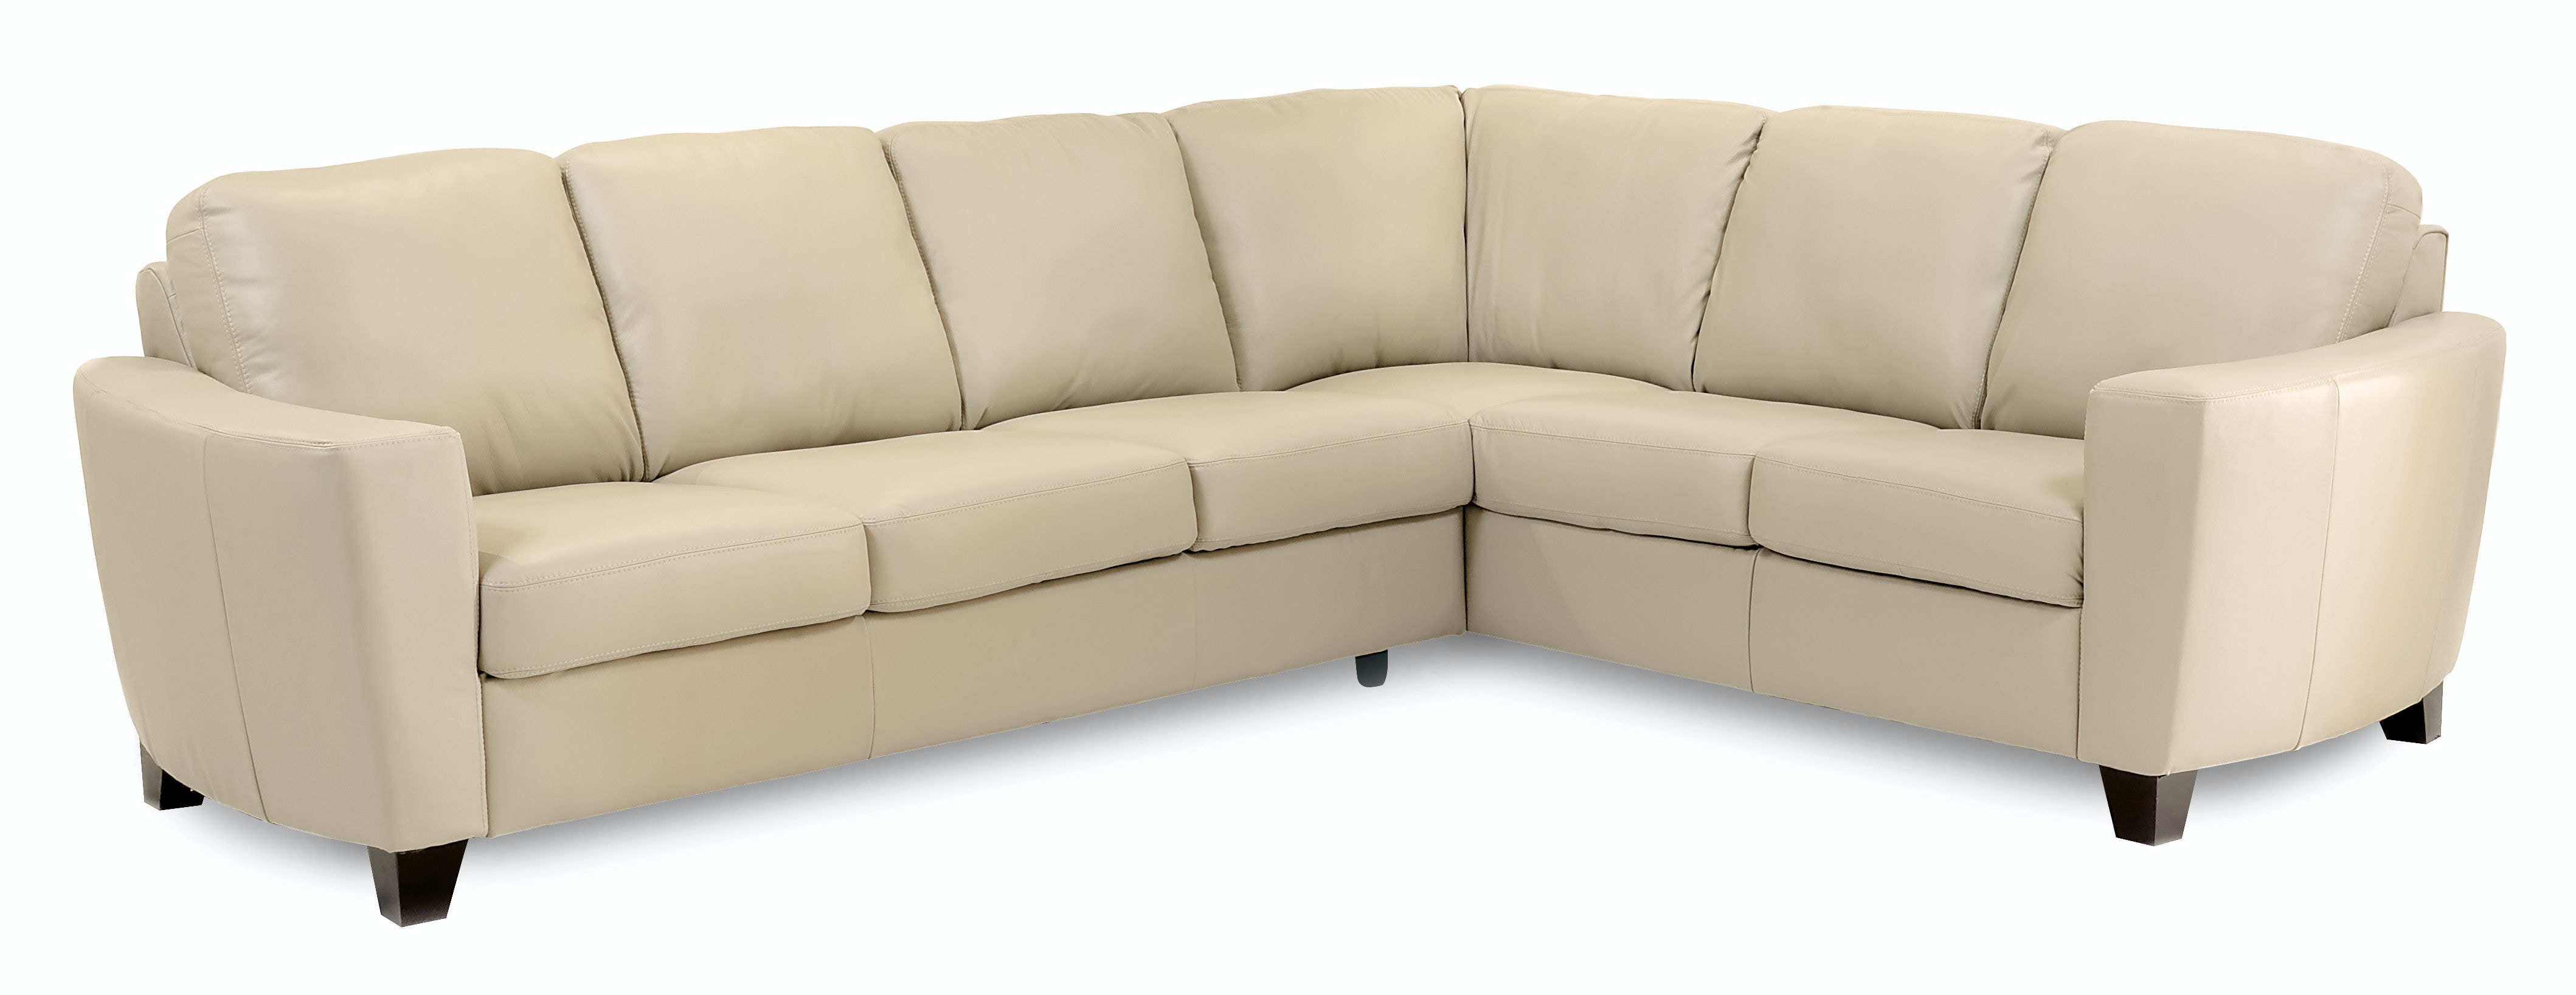 palliser furniture living room leeds sectional 77328 living room leeds reviews 2015 best auto reviews